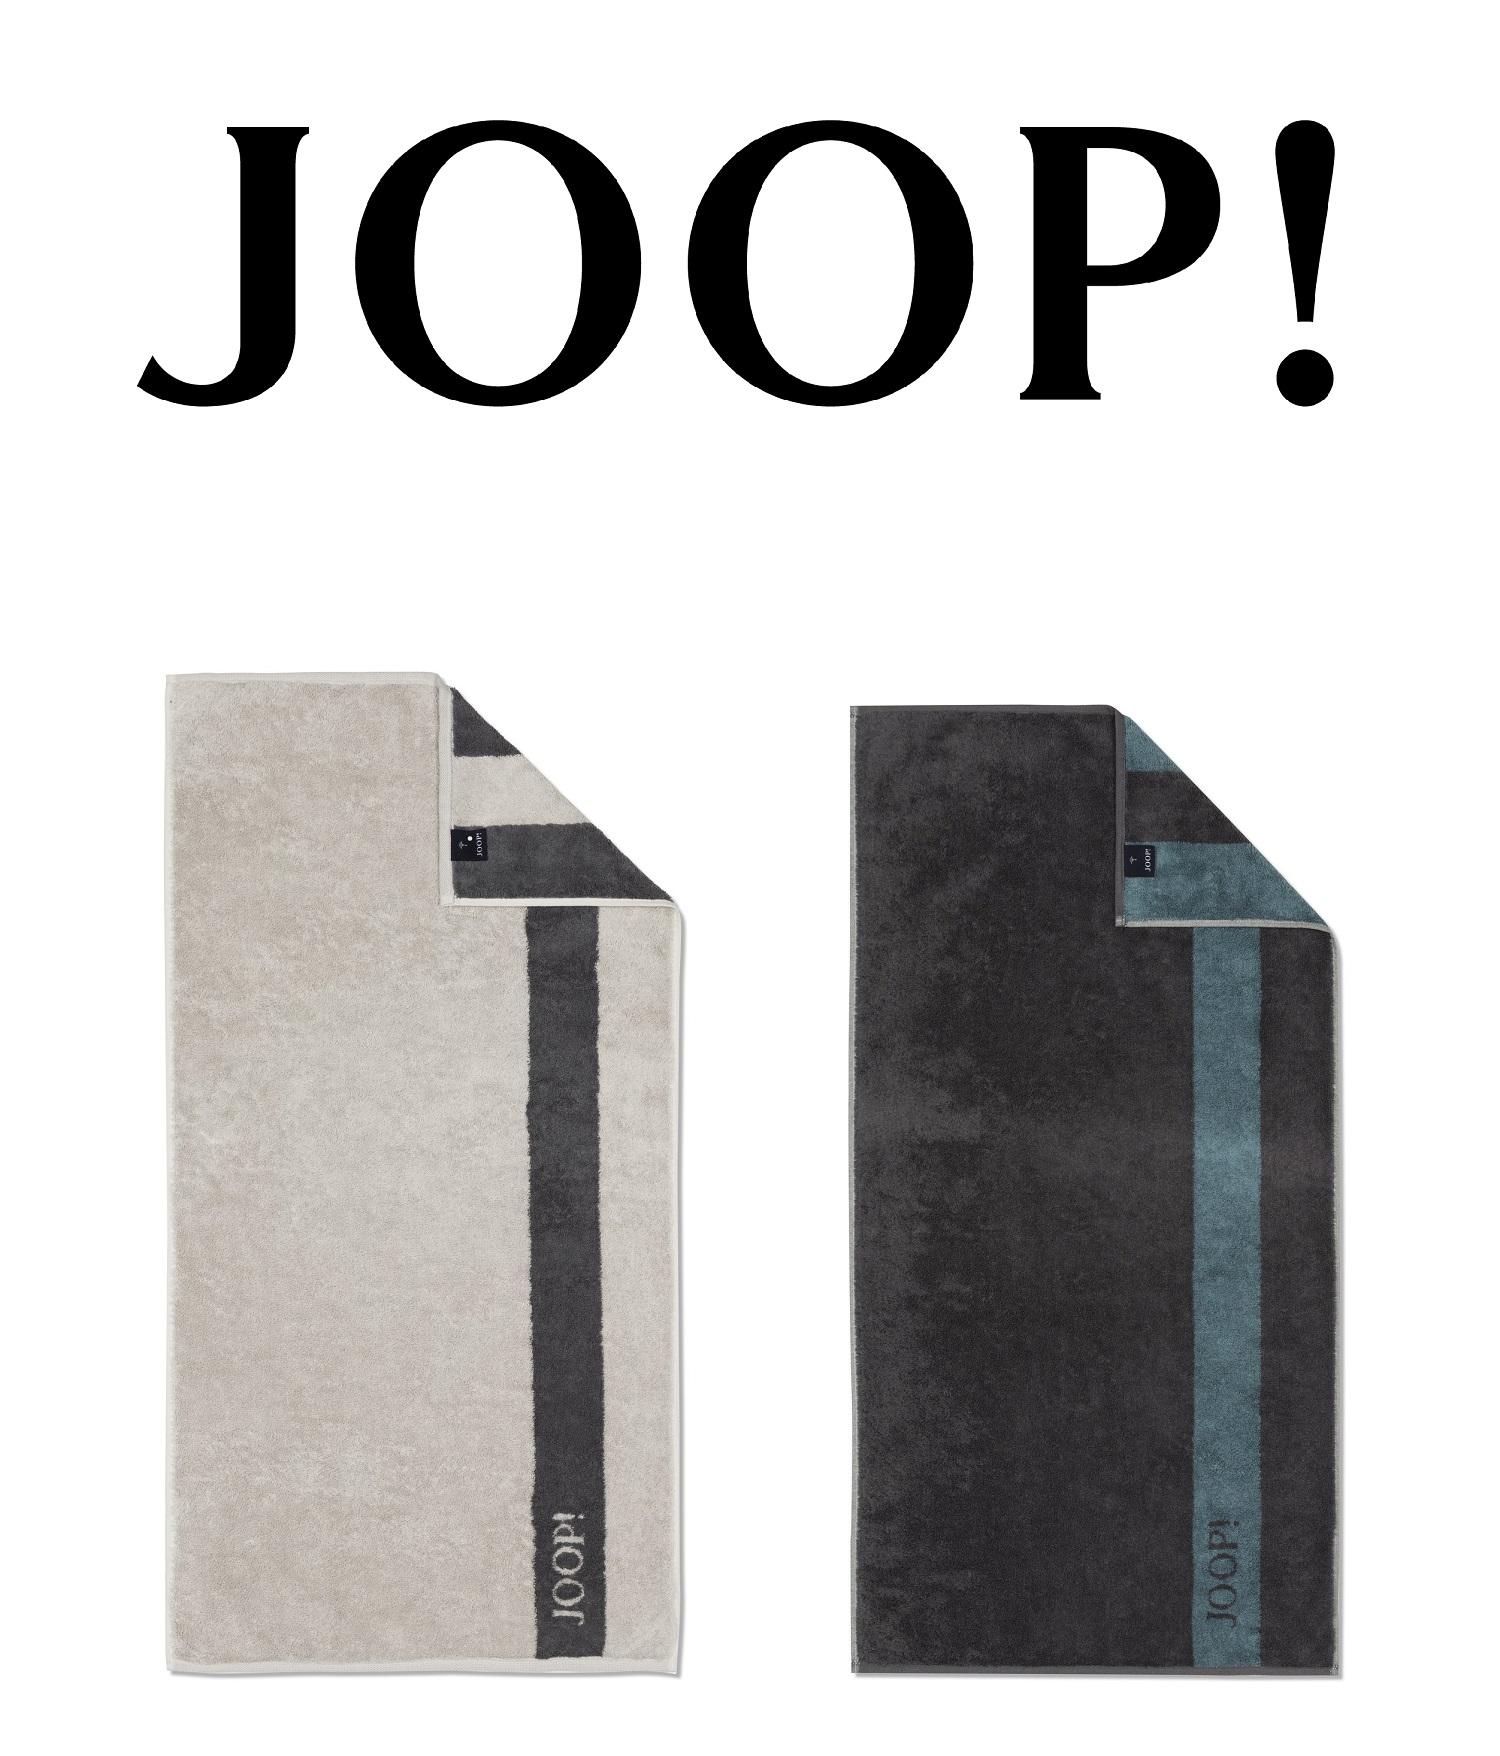 JOOP! Frottierkollektion Infinity Doubleface 1678 extraflauschige Qualität 100% Baumwolle